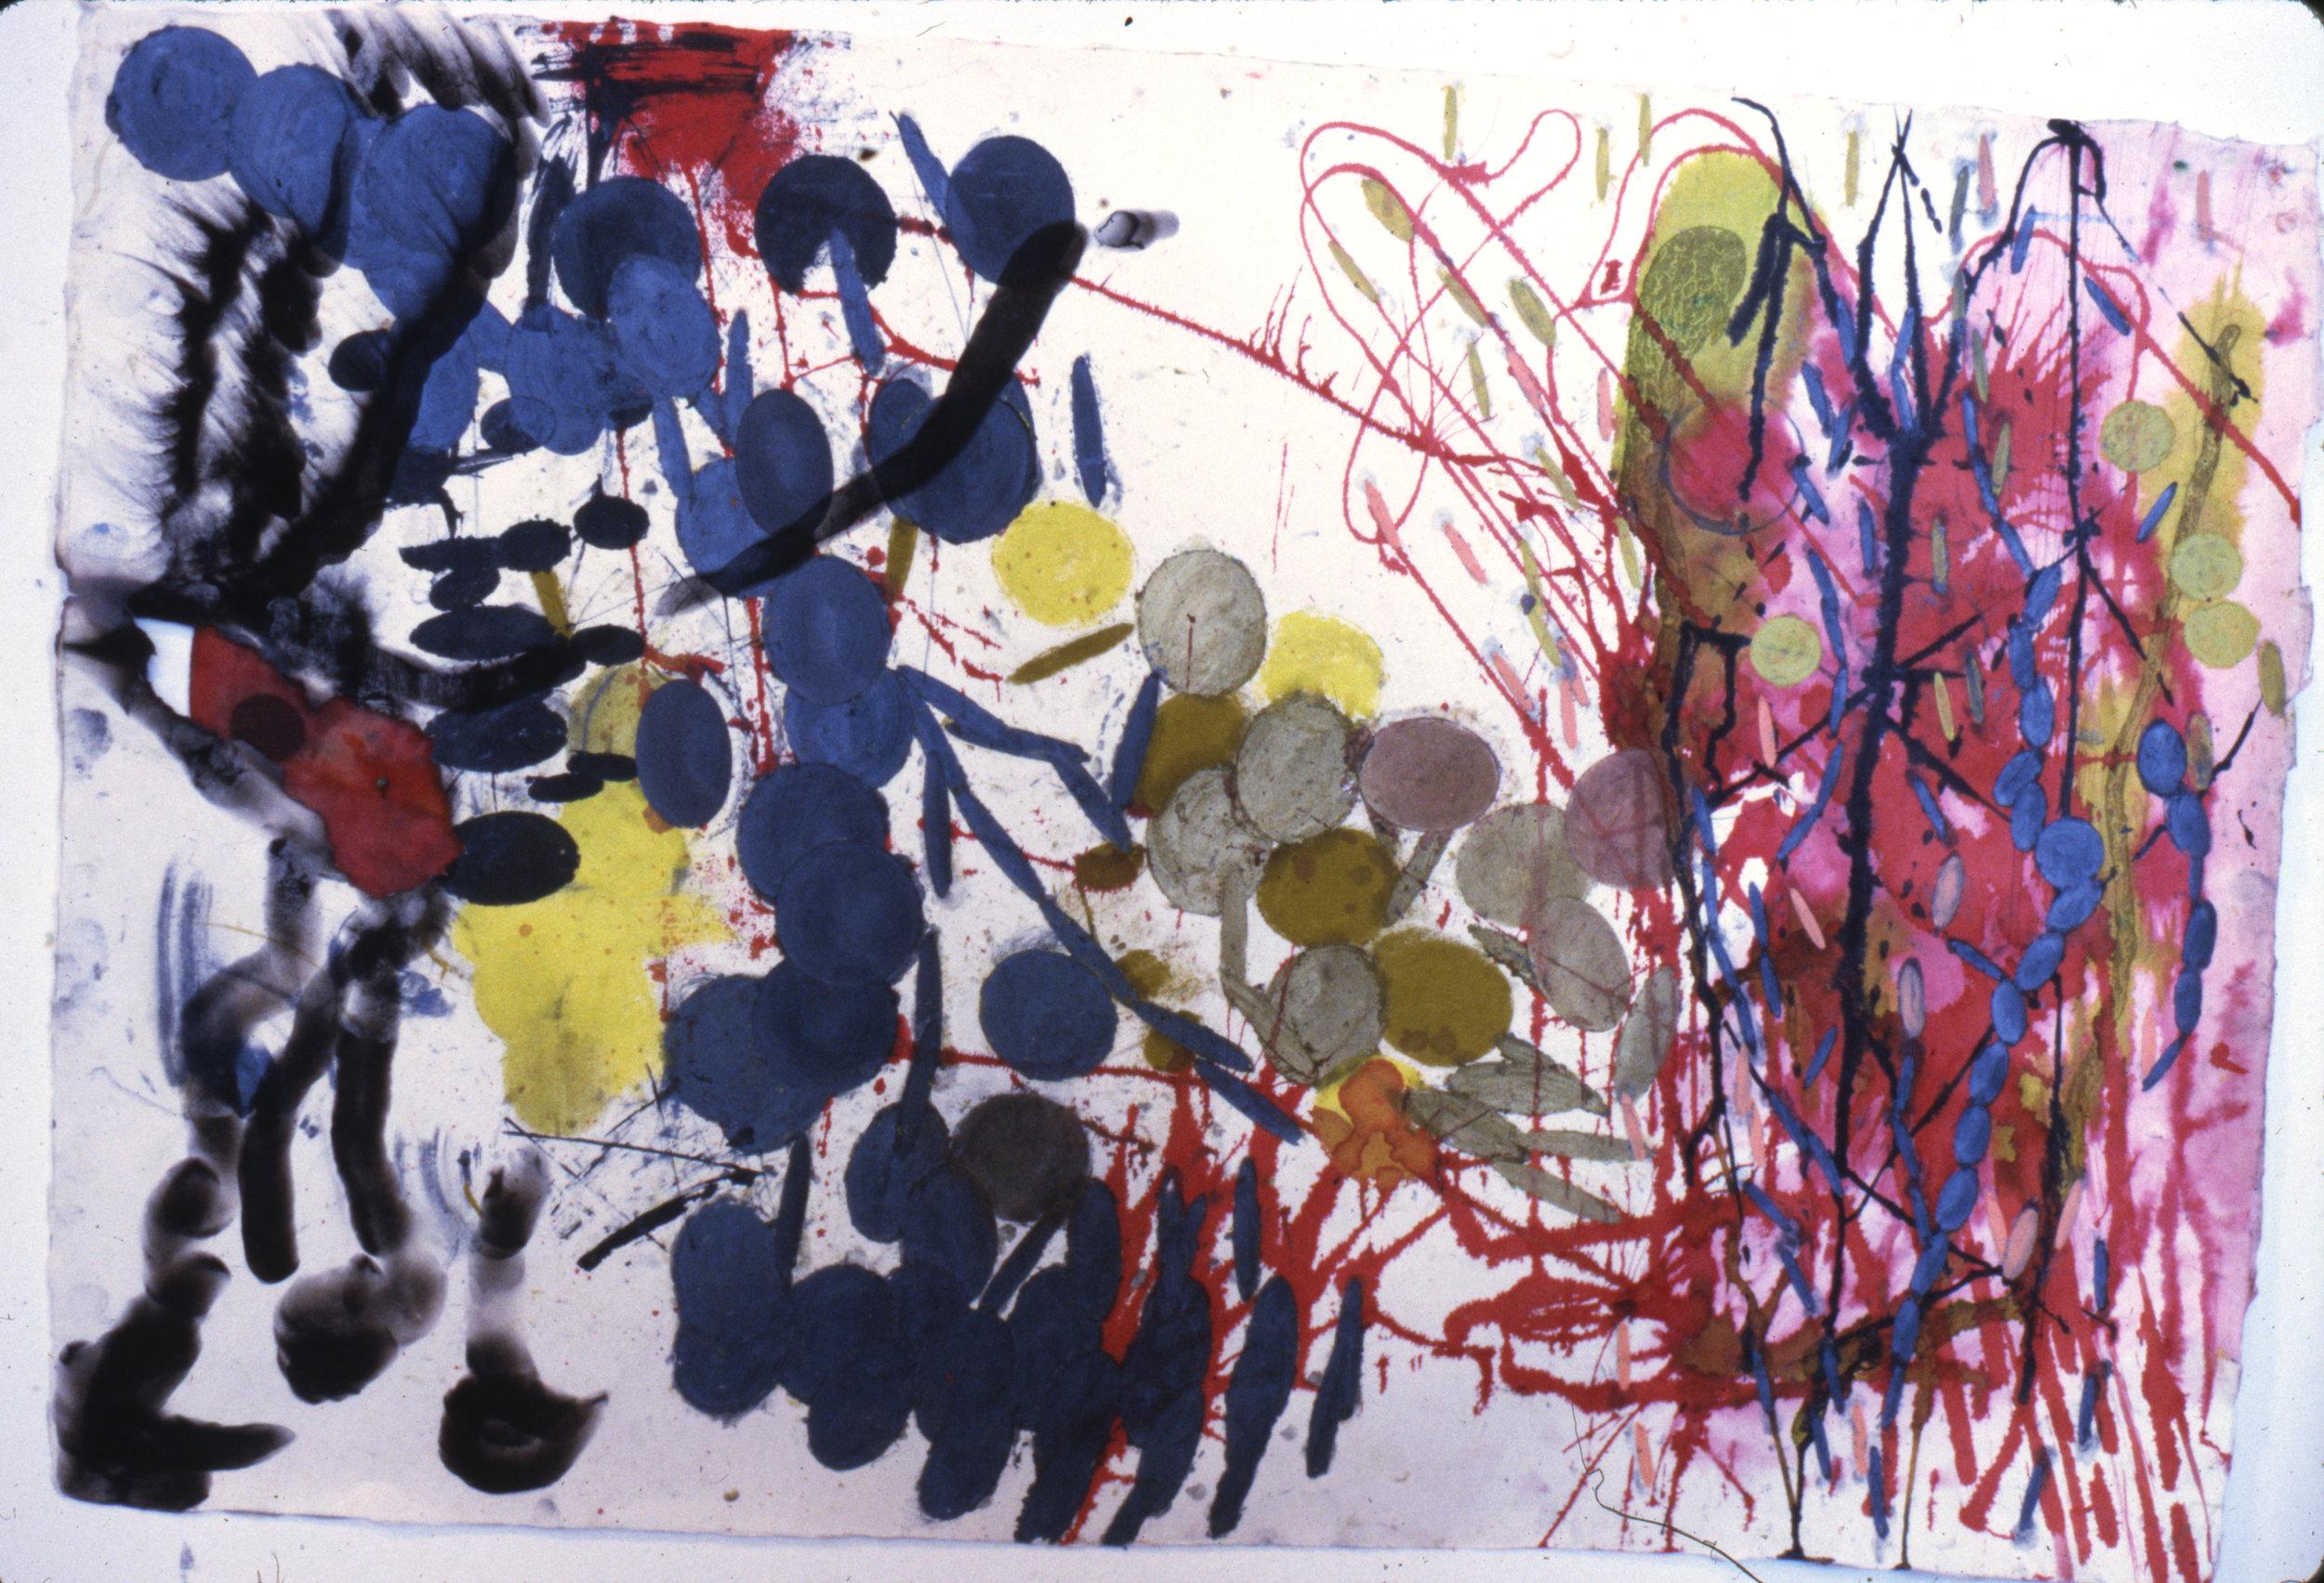 Corpo Onbroso (1), 1993